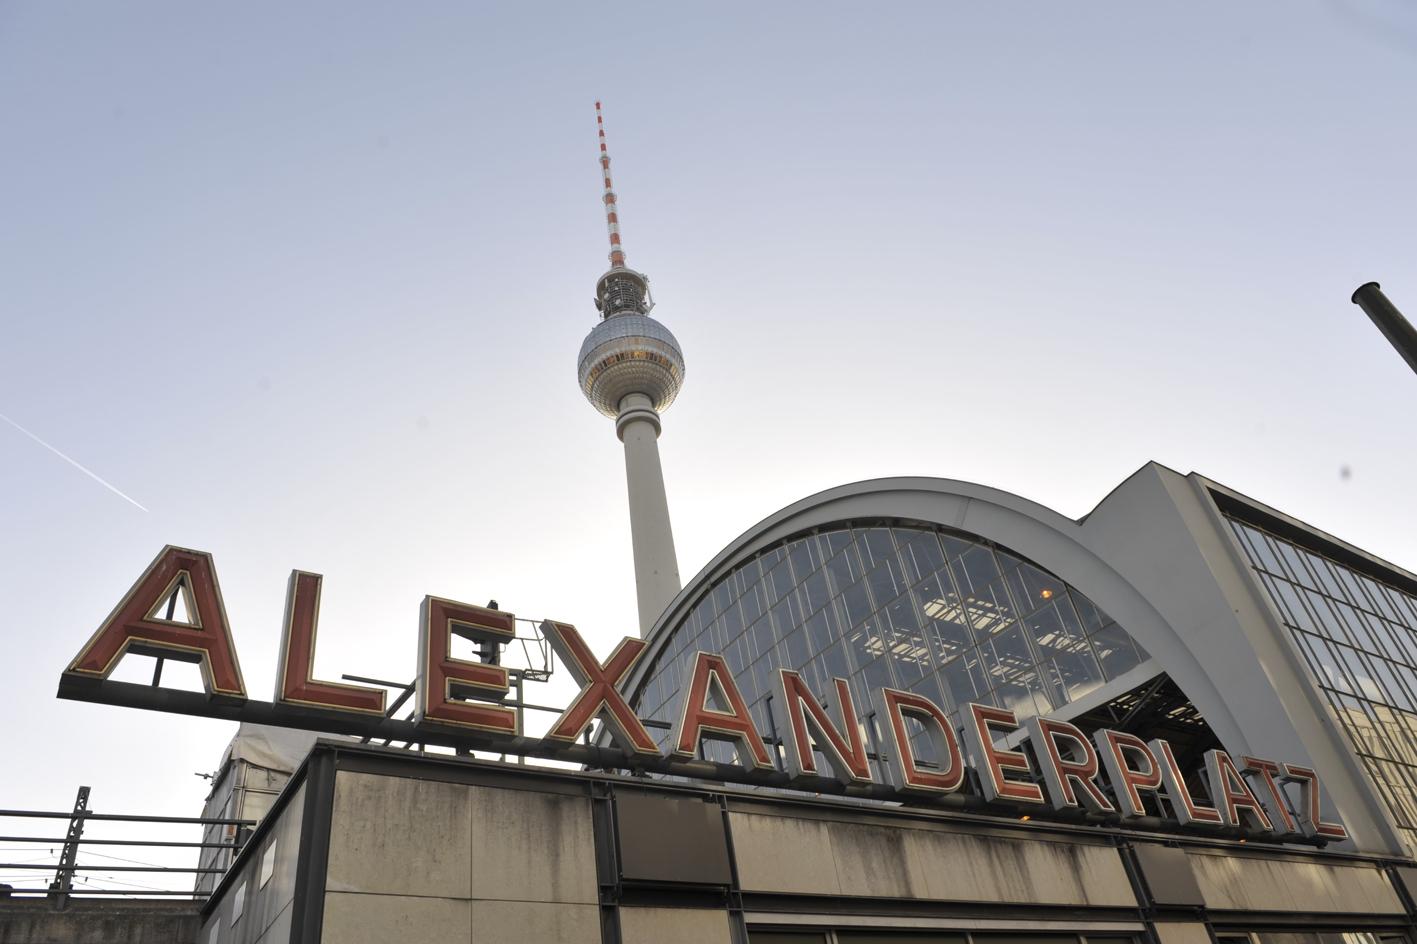 Alexanderplatz and Fernsehturm